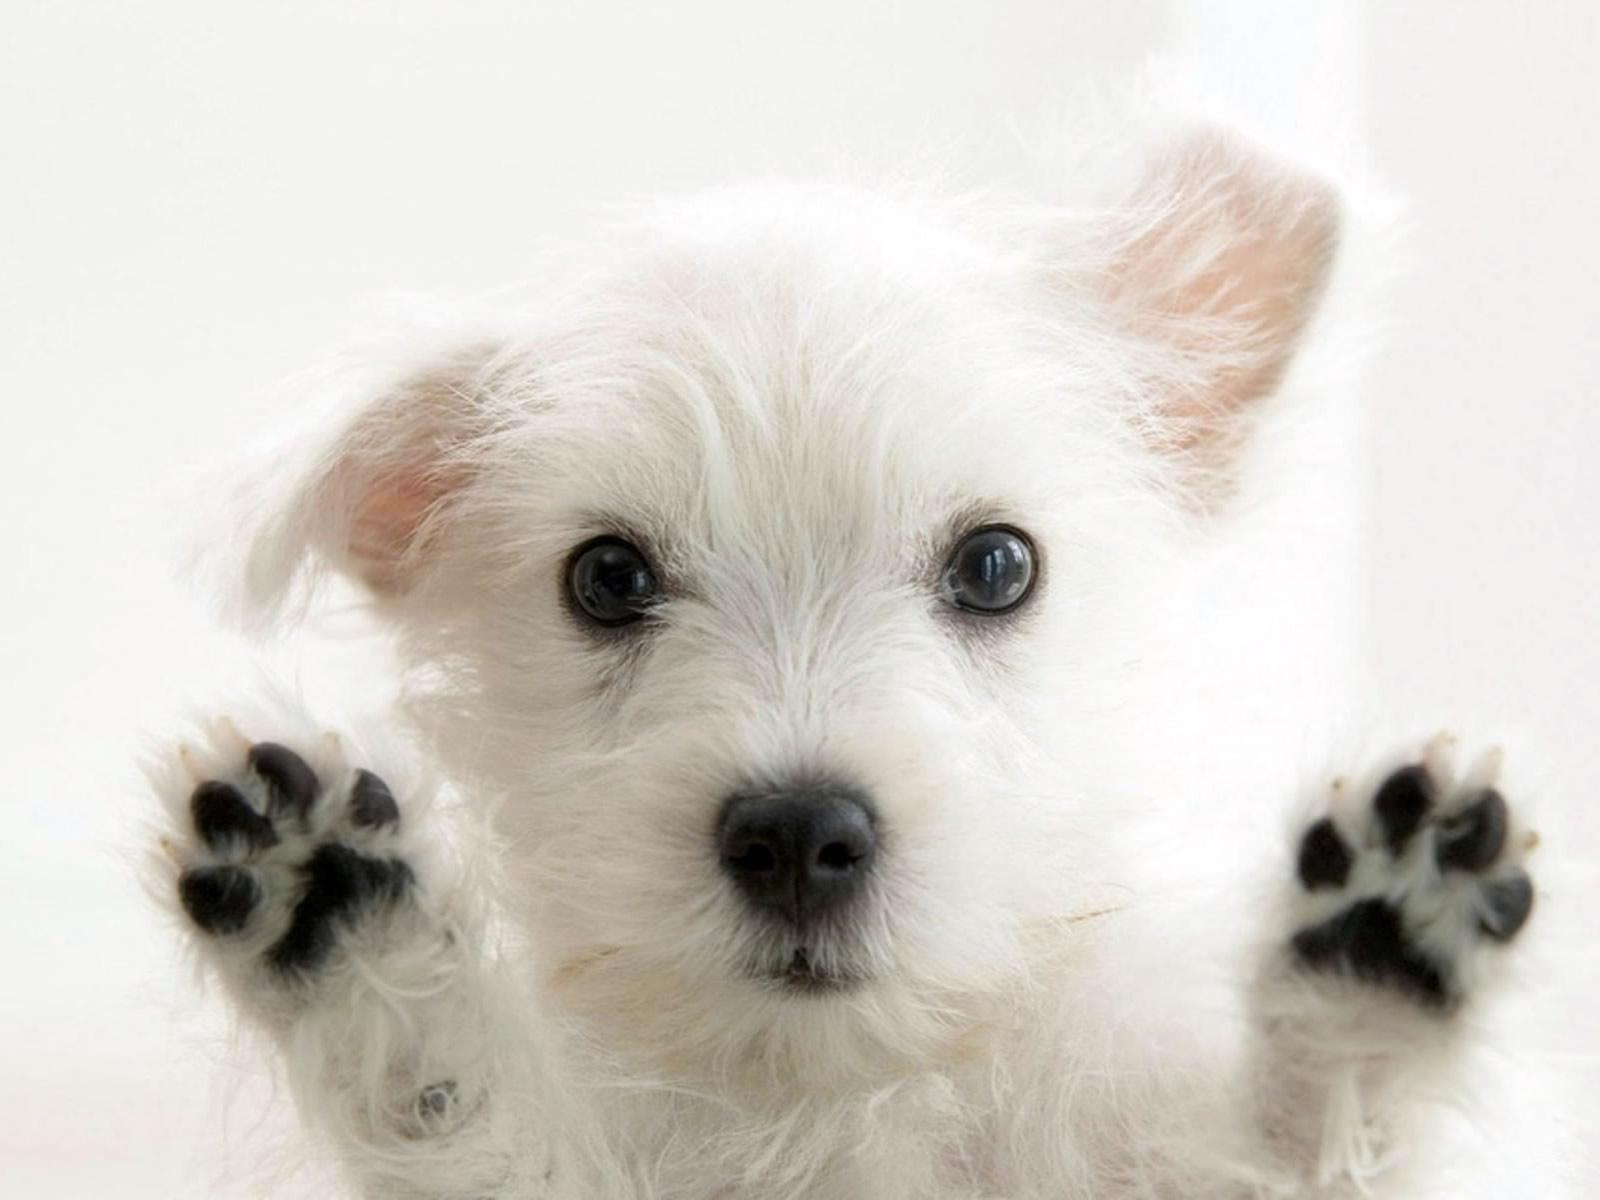 http://2.bp.blogspot.com/-NmyKQKzzUy8/T893MbzPBII/AAAAAAAAGAs/sX2HhWJnyyg/s1600/Cute+white+dog.jpg